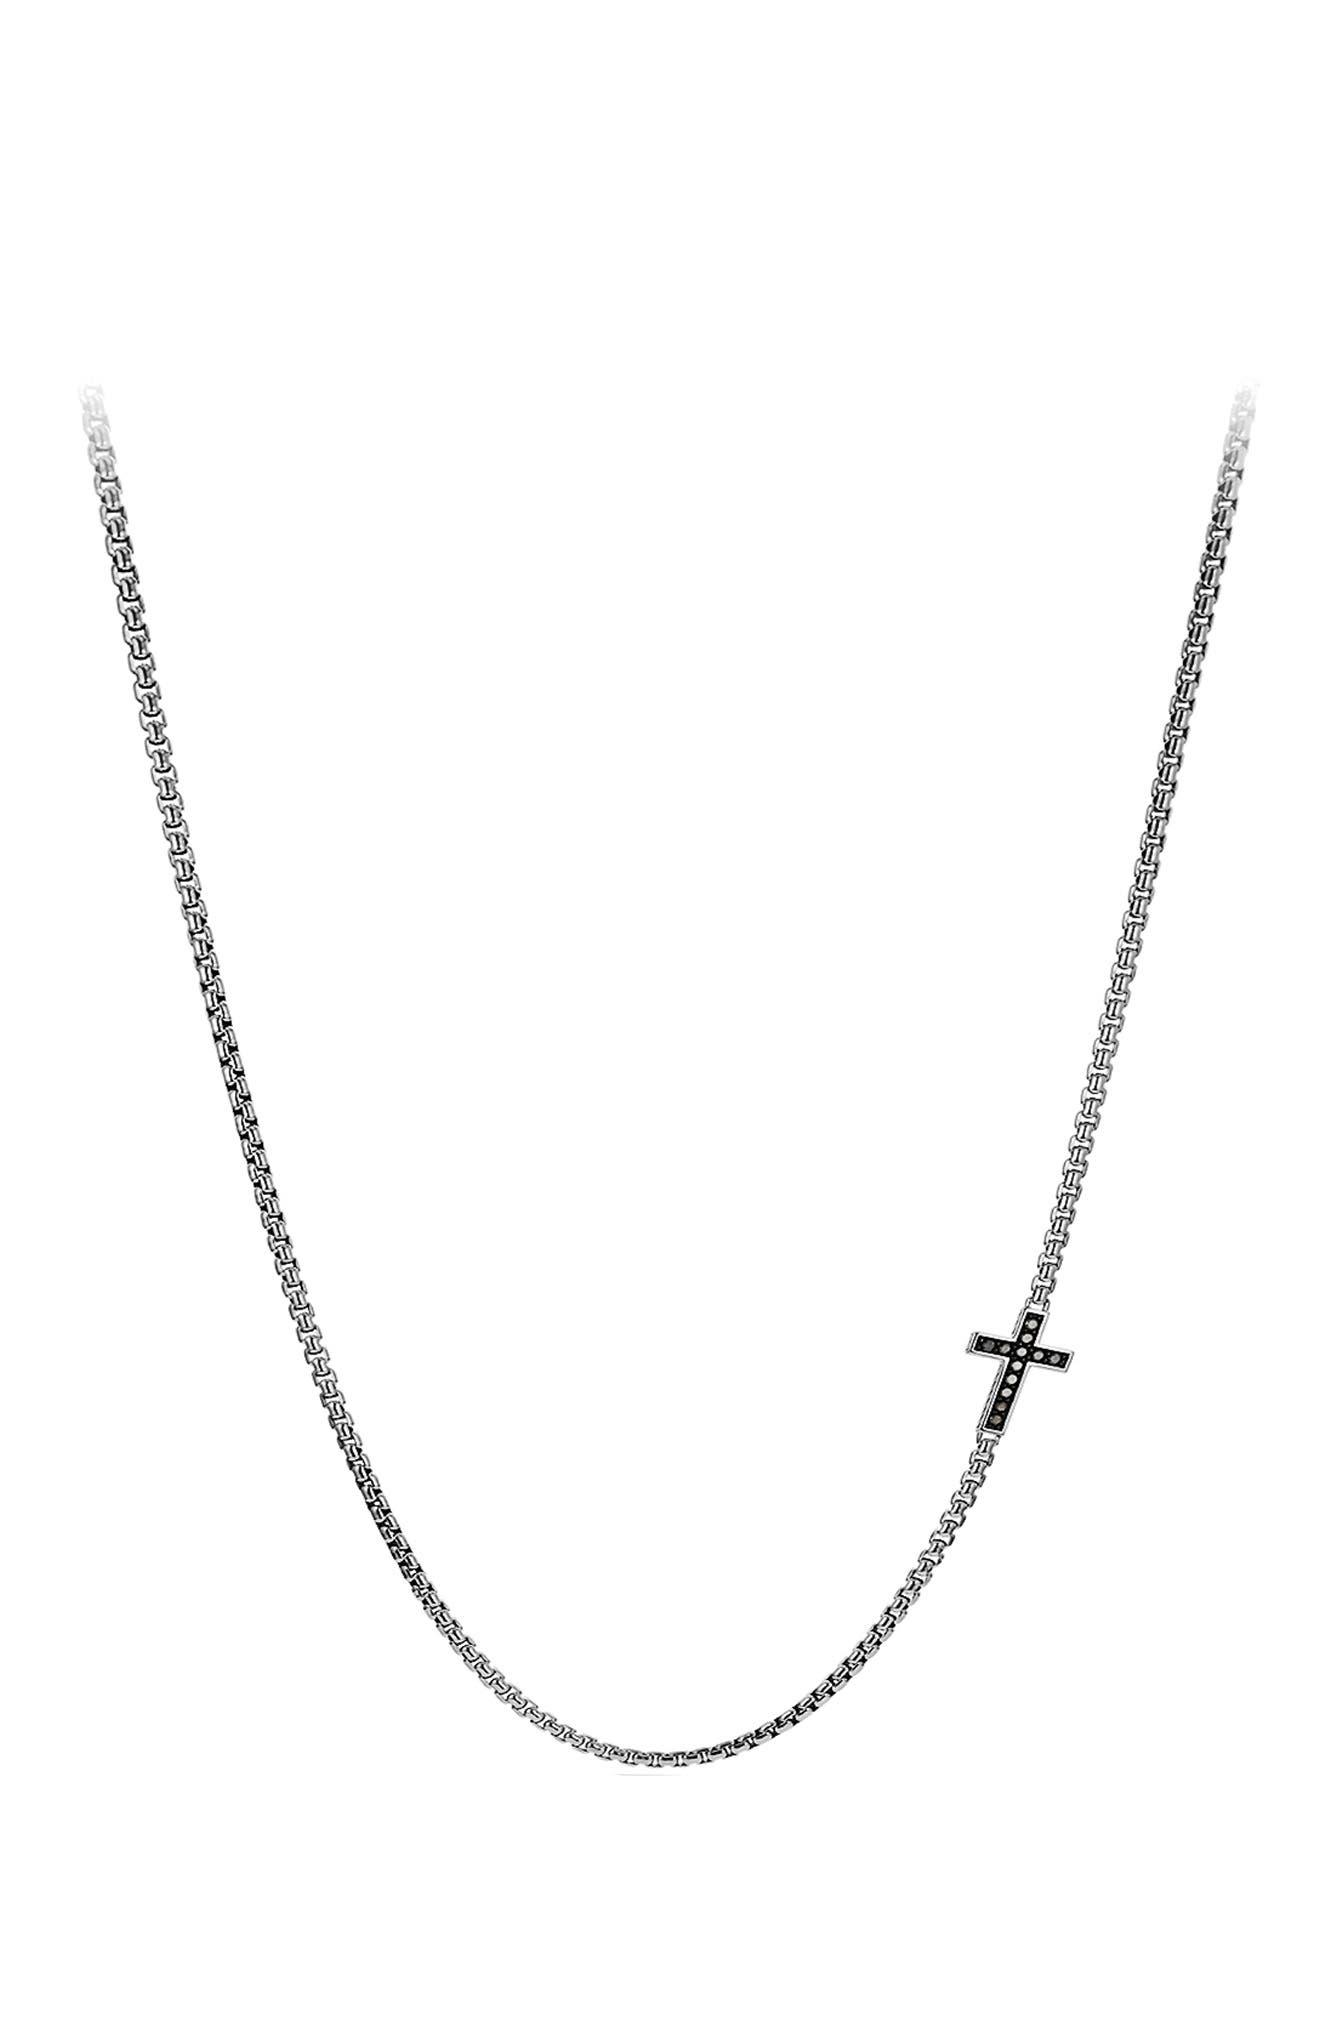 Pavé Cross Necklace with Diamonds,                             Main thumbnail 1, color,                             BLACK DIAMOND